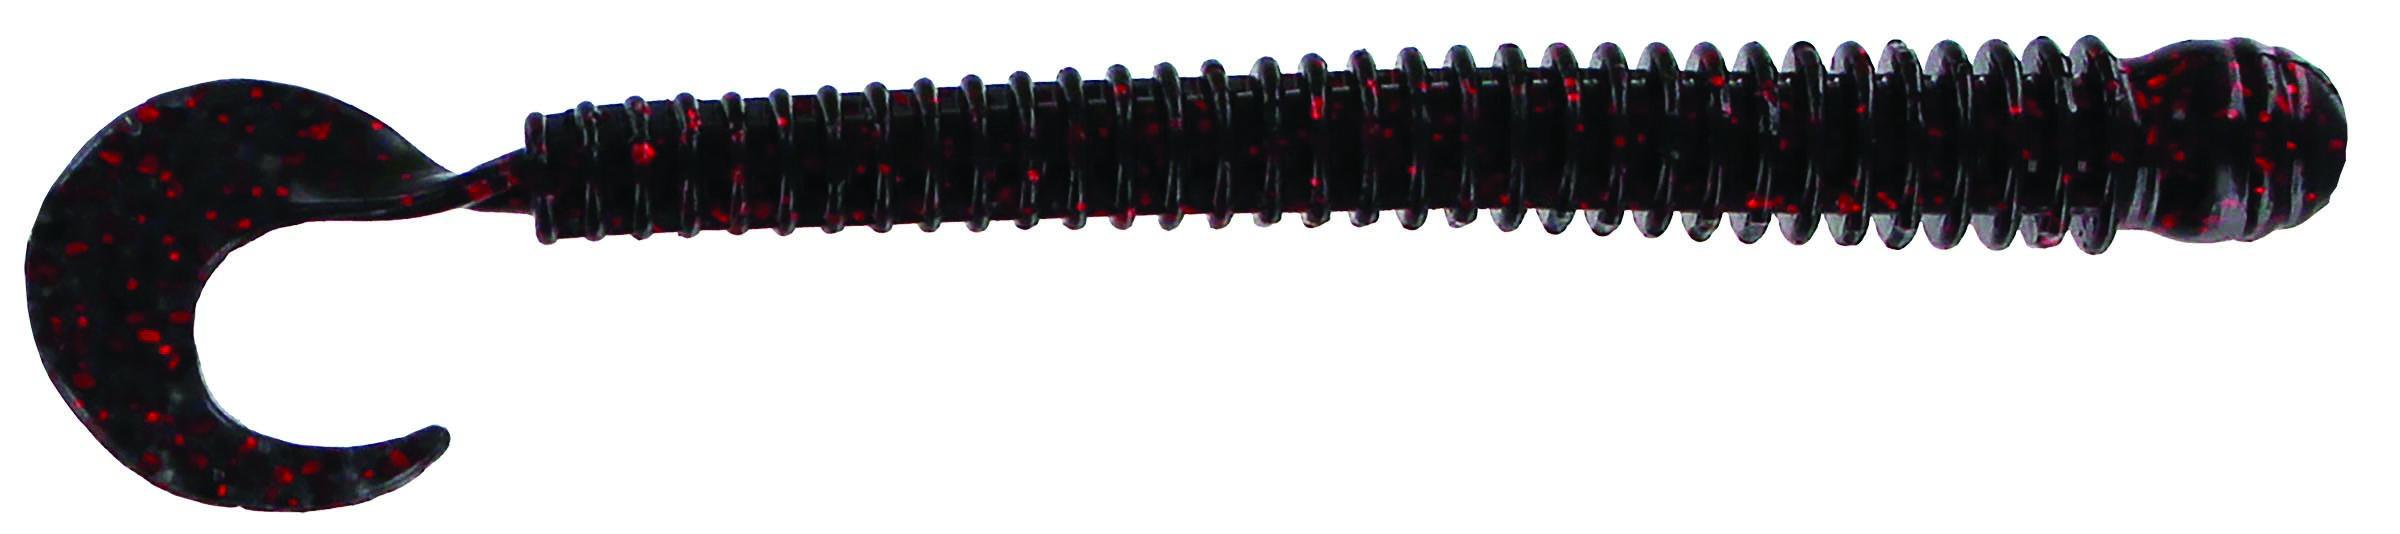 Big Bite Baits - Disc Ring Worm - 4 inch - RW-410 - BLACK NEON